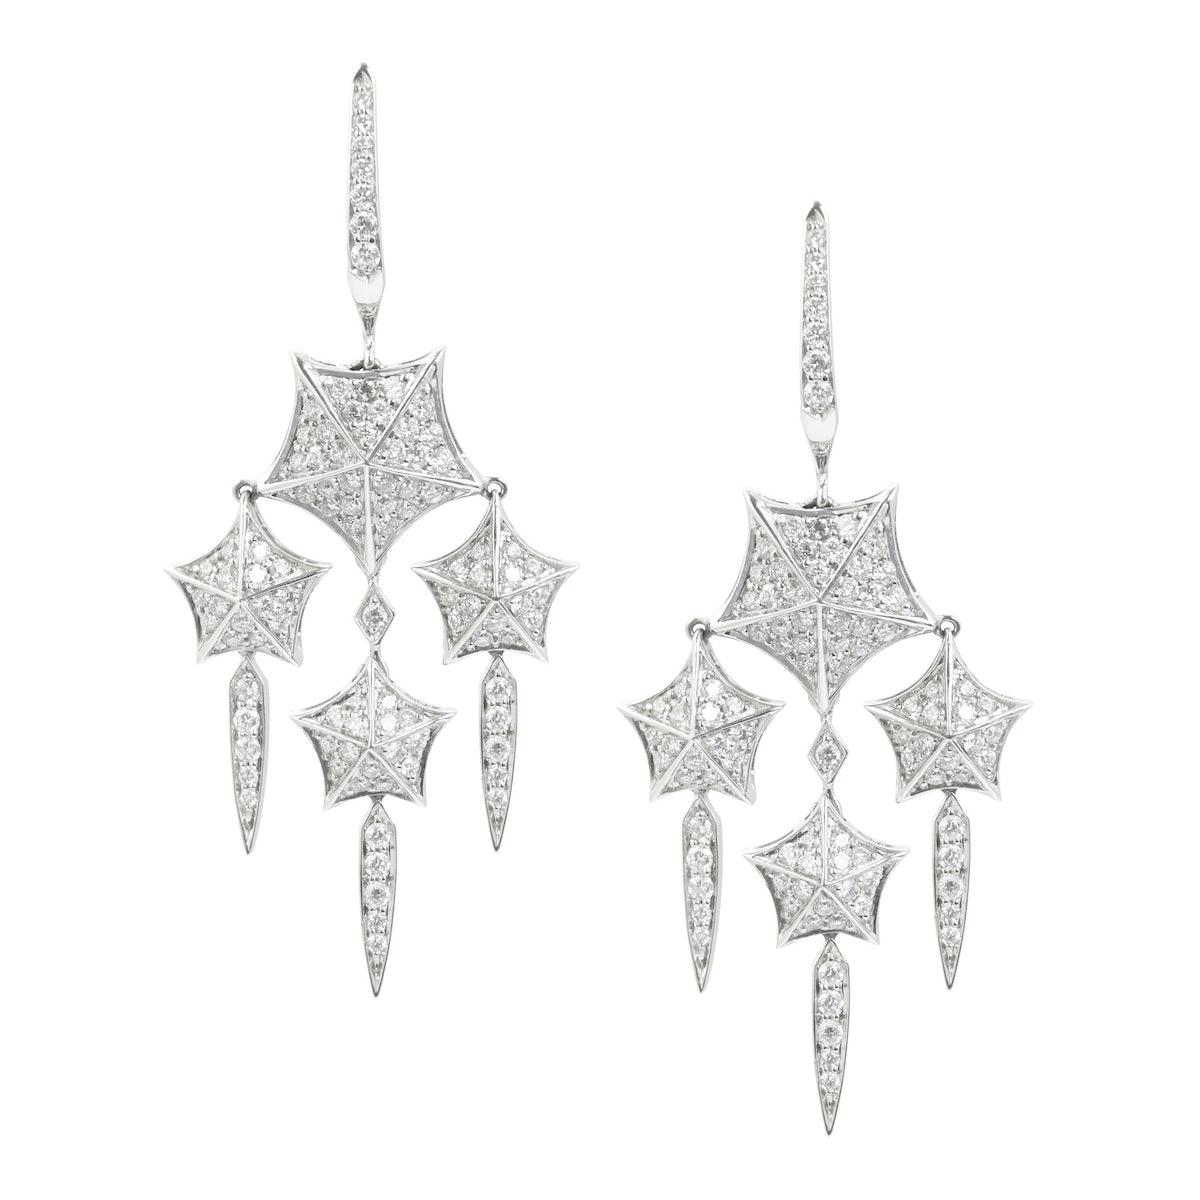 Stephen Webster 18k white gold earrings set with white diamond pave earrings